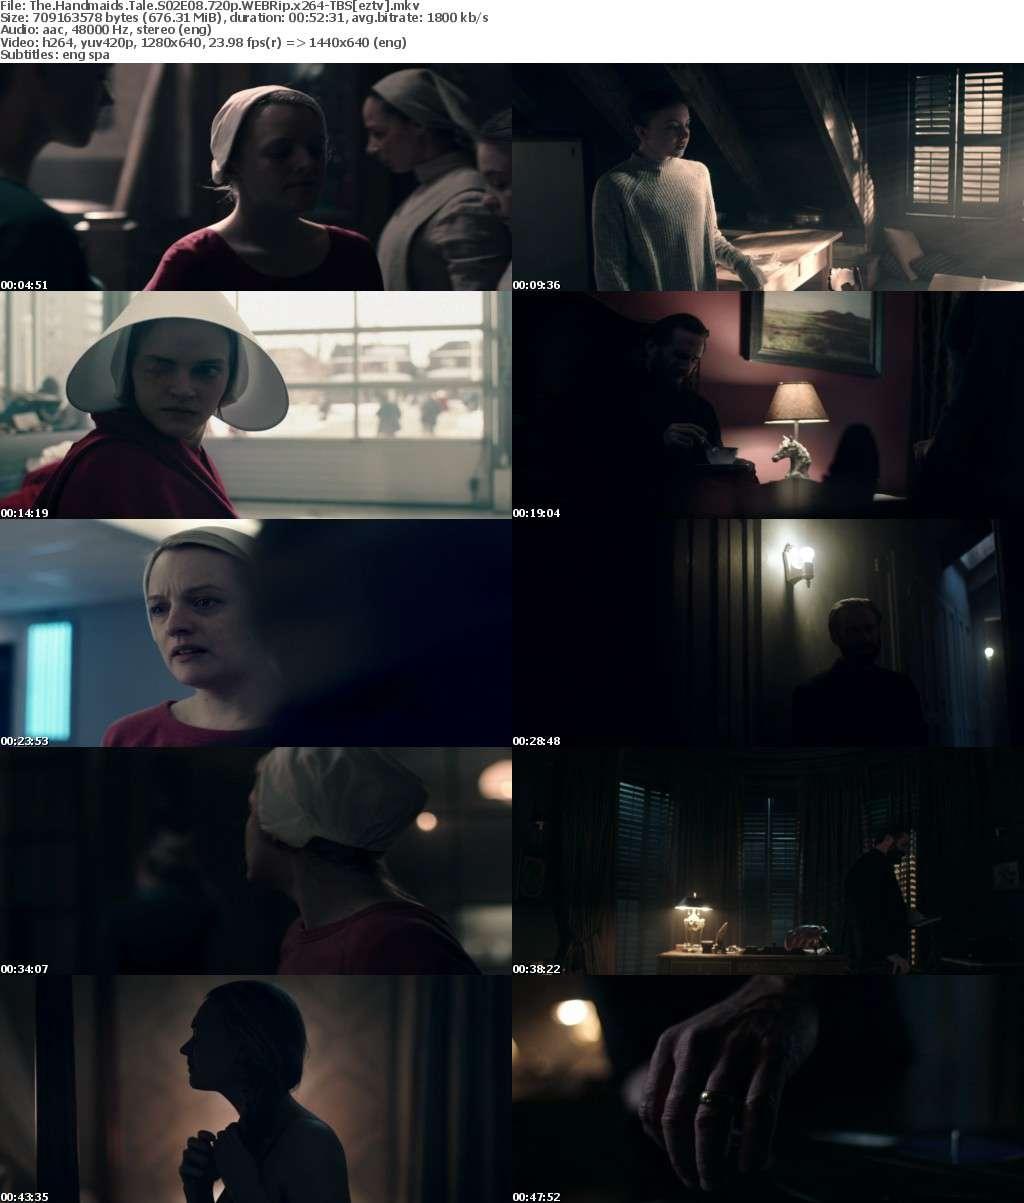 The Handmaids Tale S02E08 720p WEBRip x264-TBS